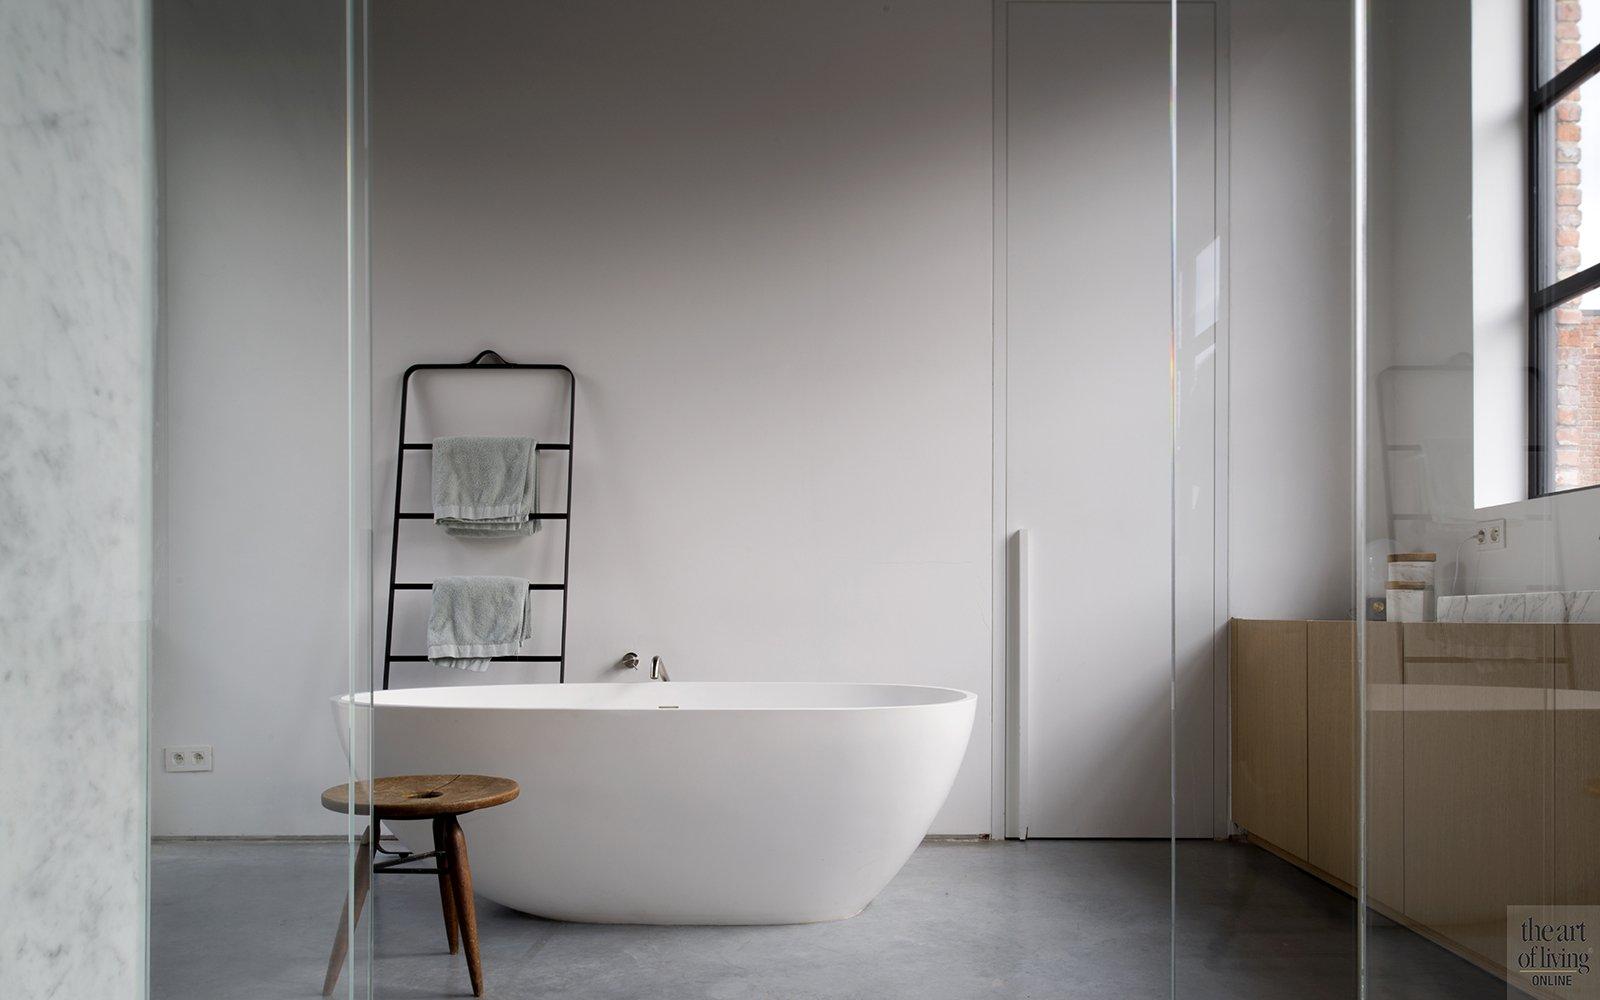 interieur make-over, kove interieurarchitecten, the art of living